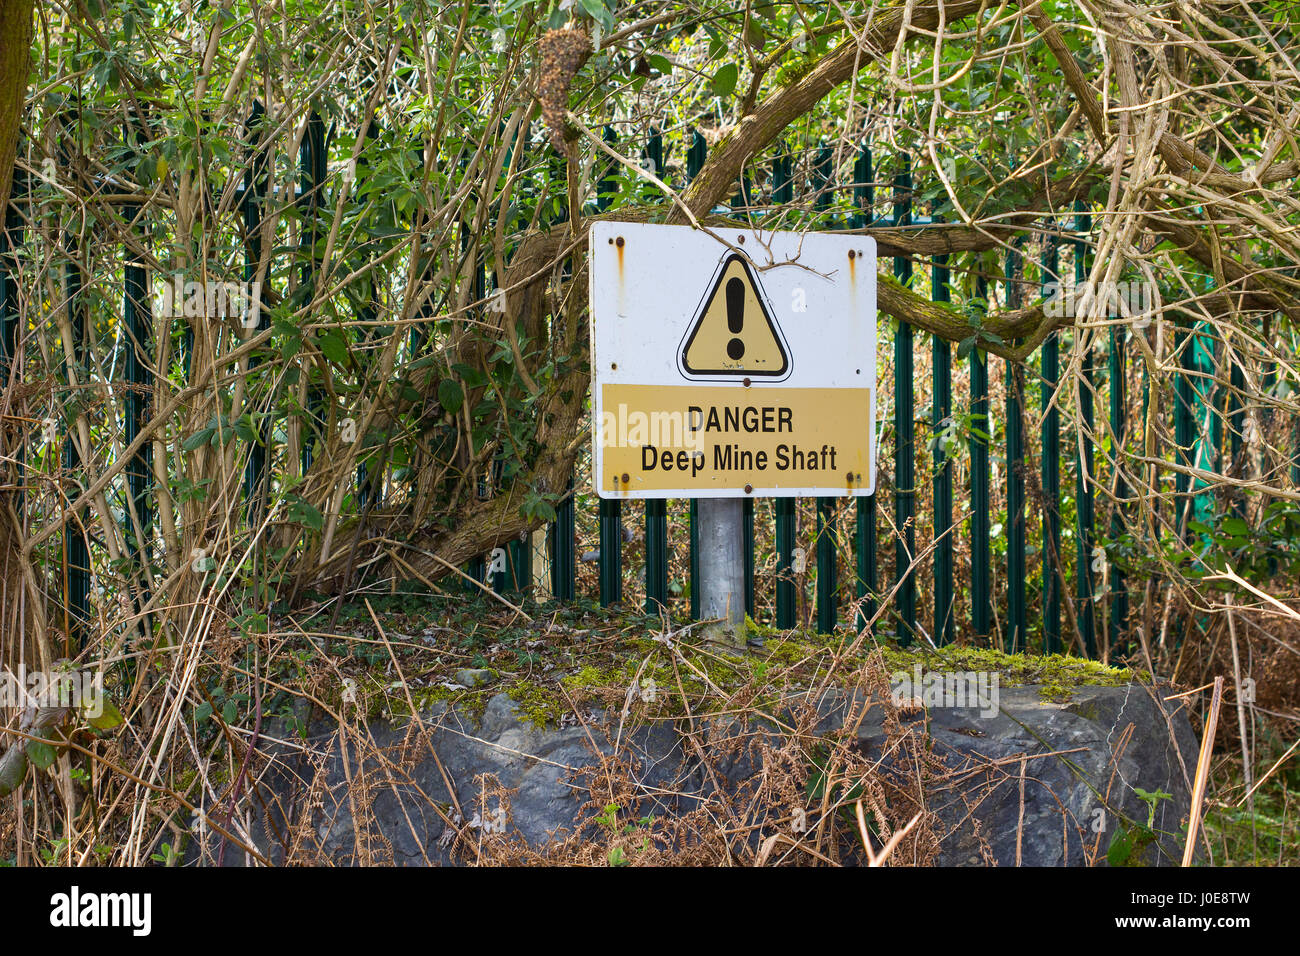 Mine Shaft Warning Sign Stock Photos & Mine Shaft Warning Sign Stock